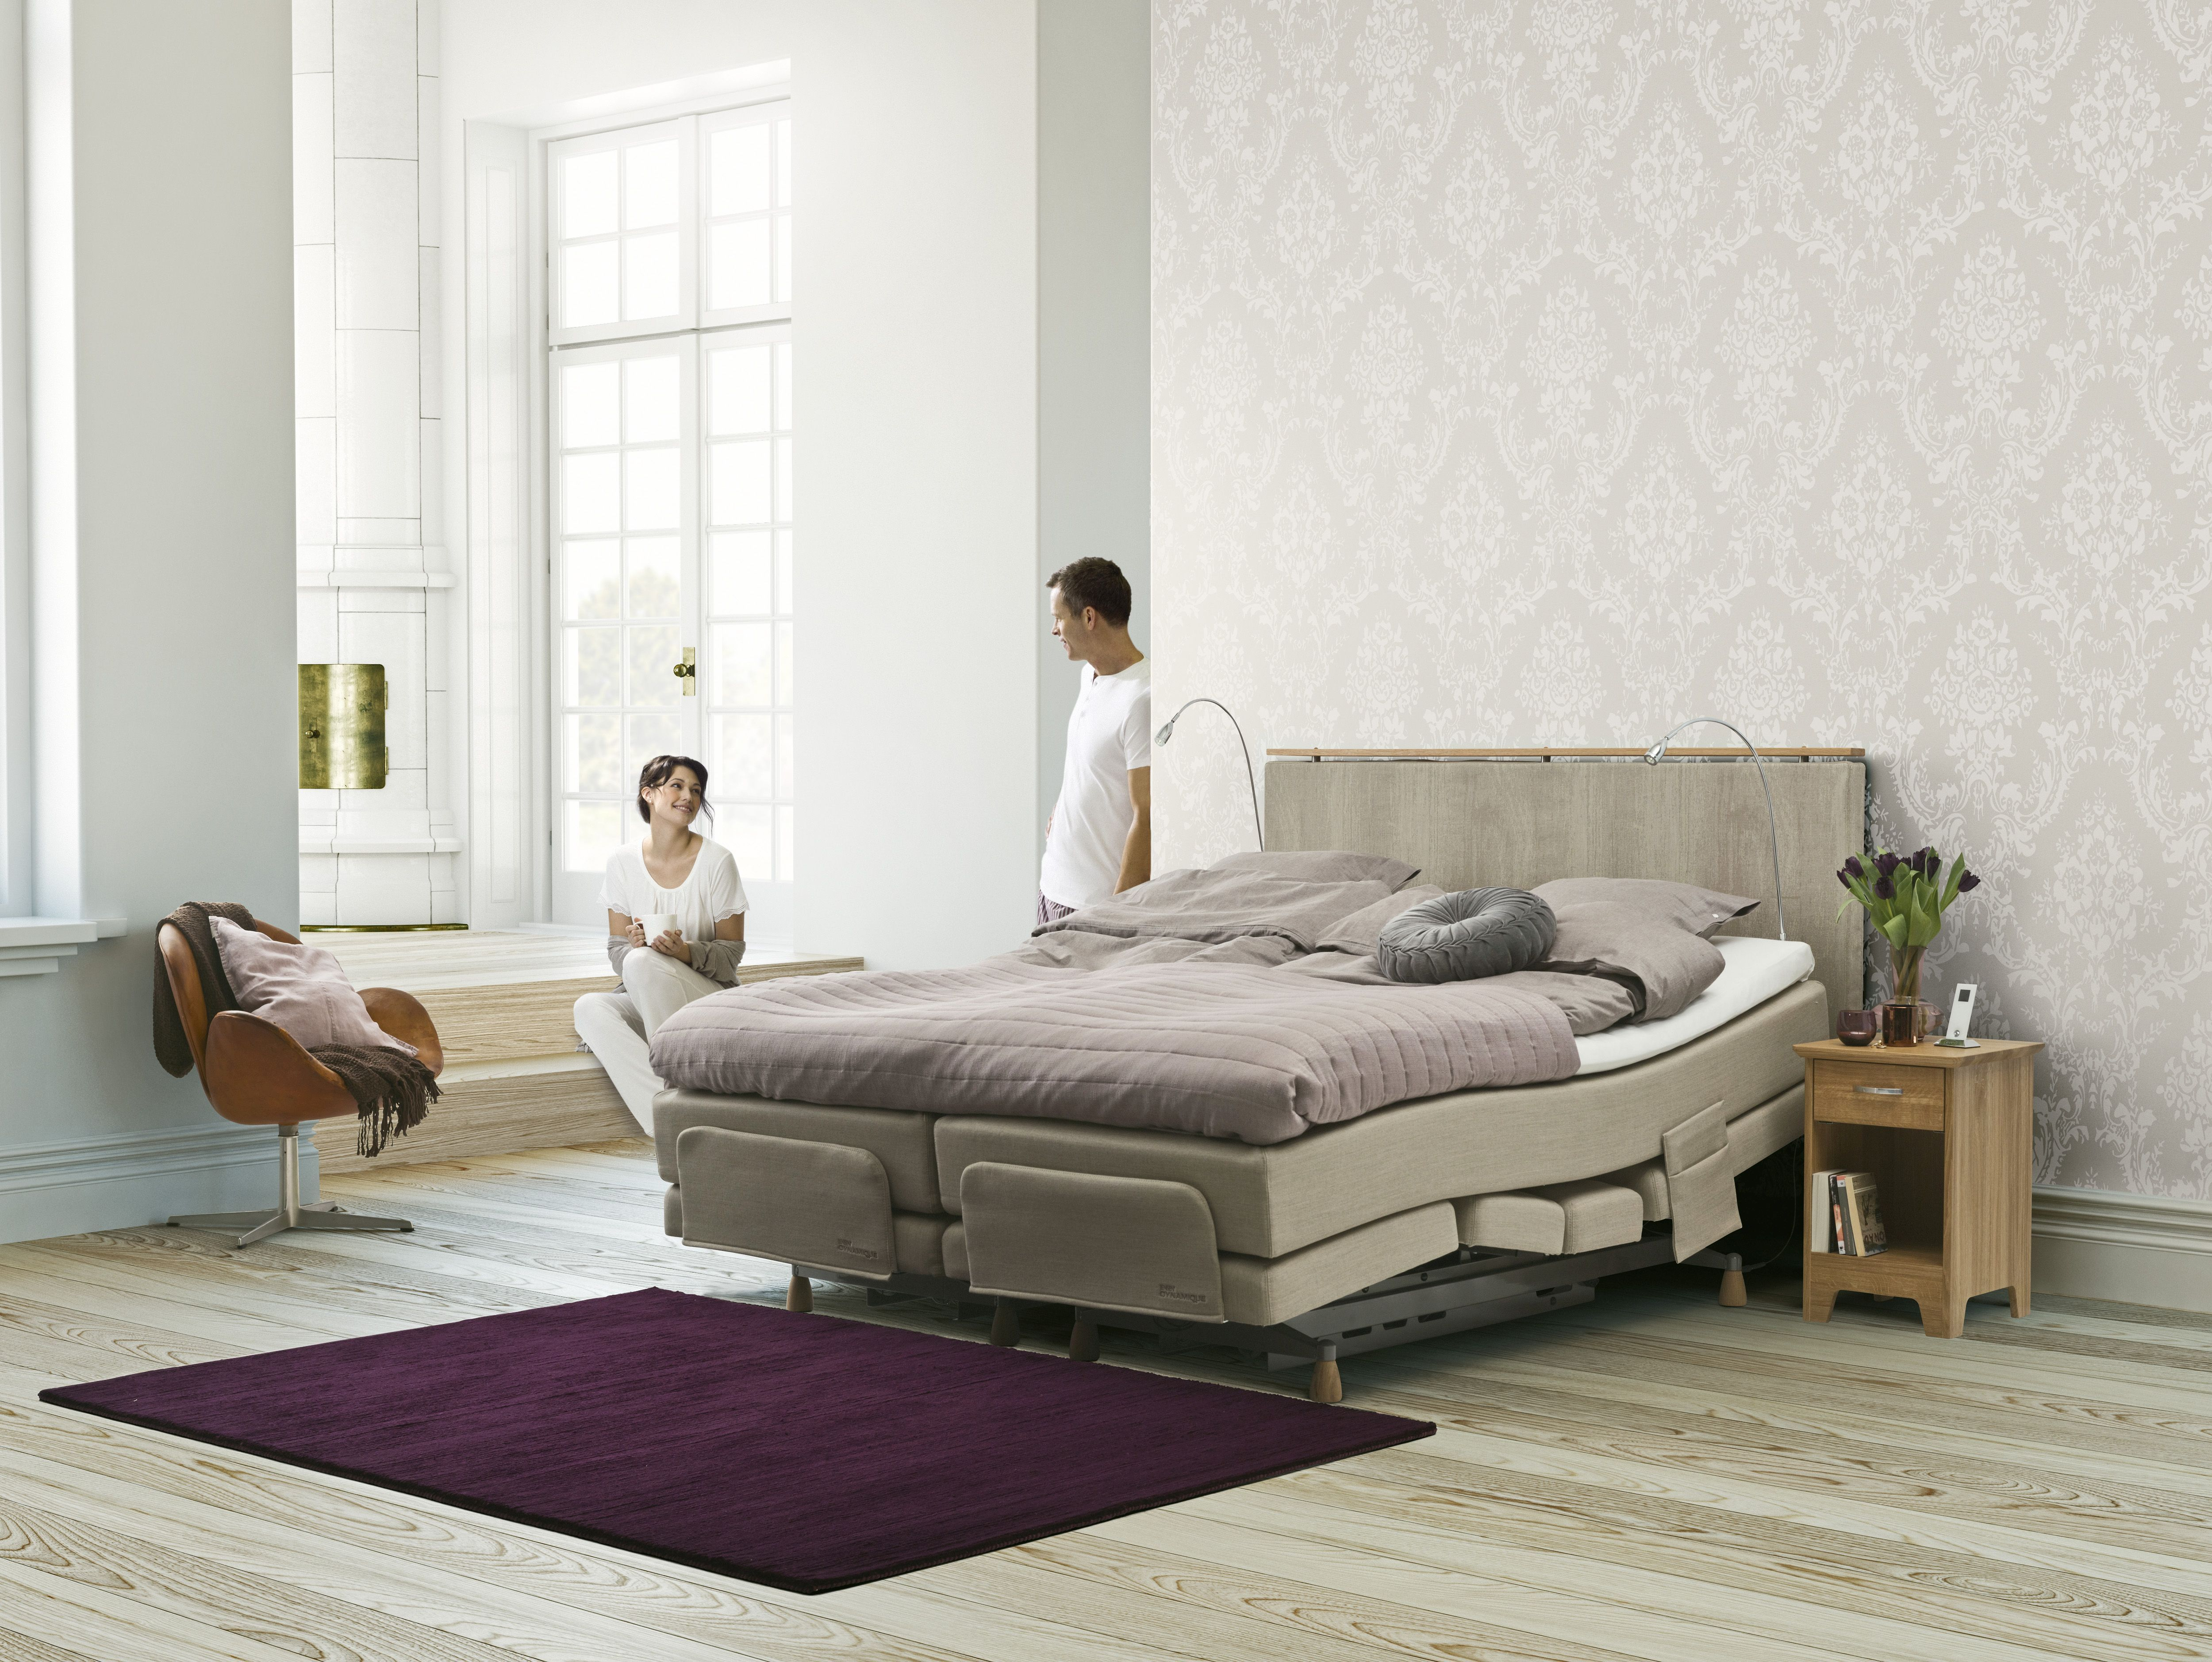 Jensen Model Supreme Dynamique Boxspring Bed Bett